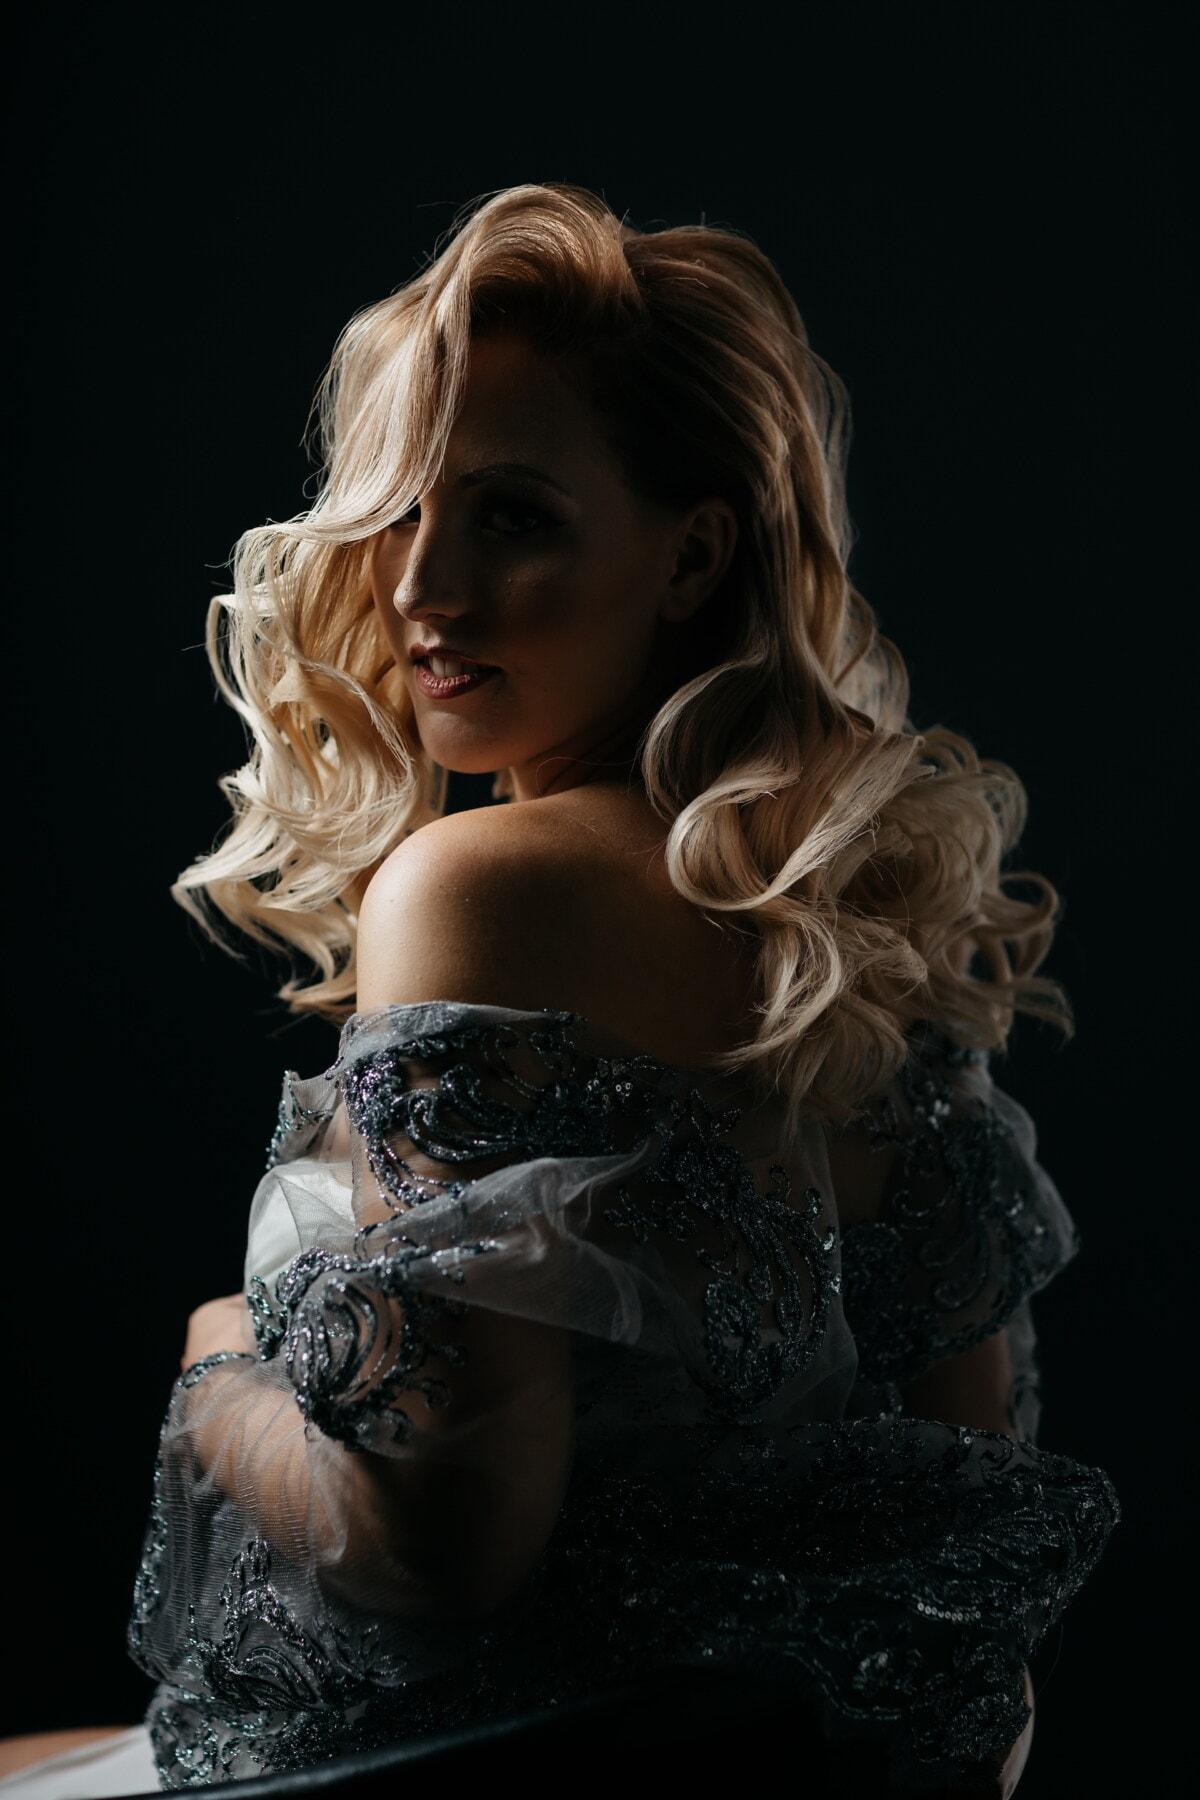 maravilloso, rubia, posando, oscuridad, modelo de fotografia, sombra, estudio de la foto, Oscuro, vertical, moda